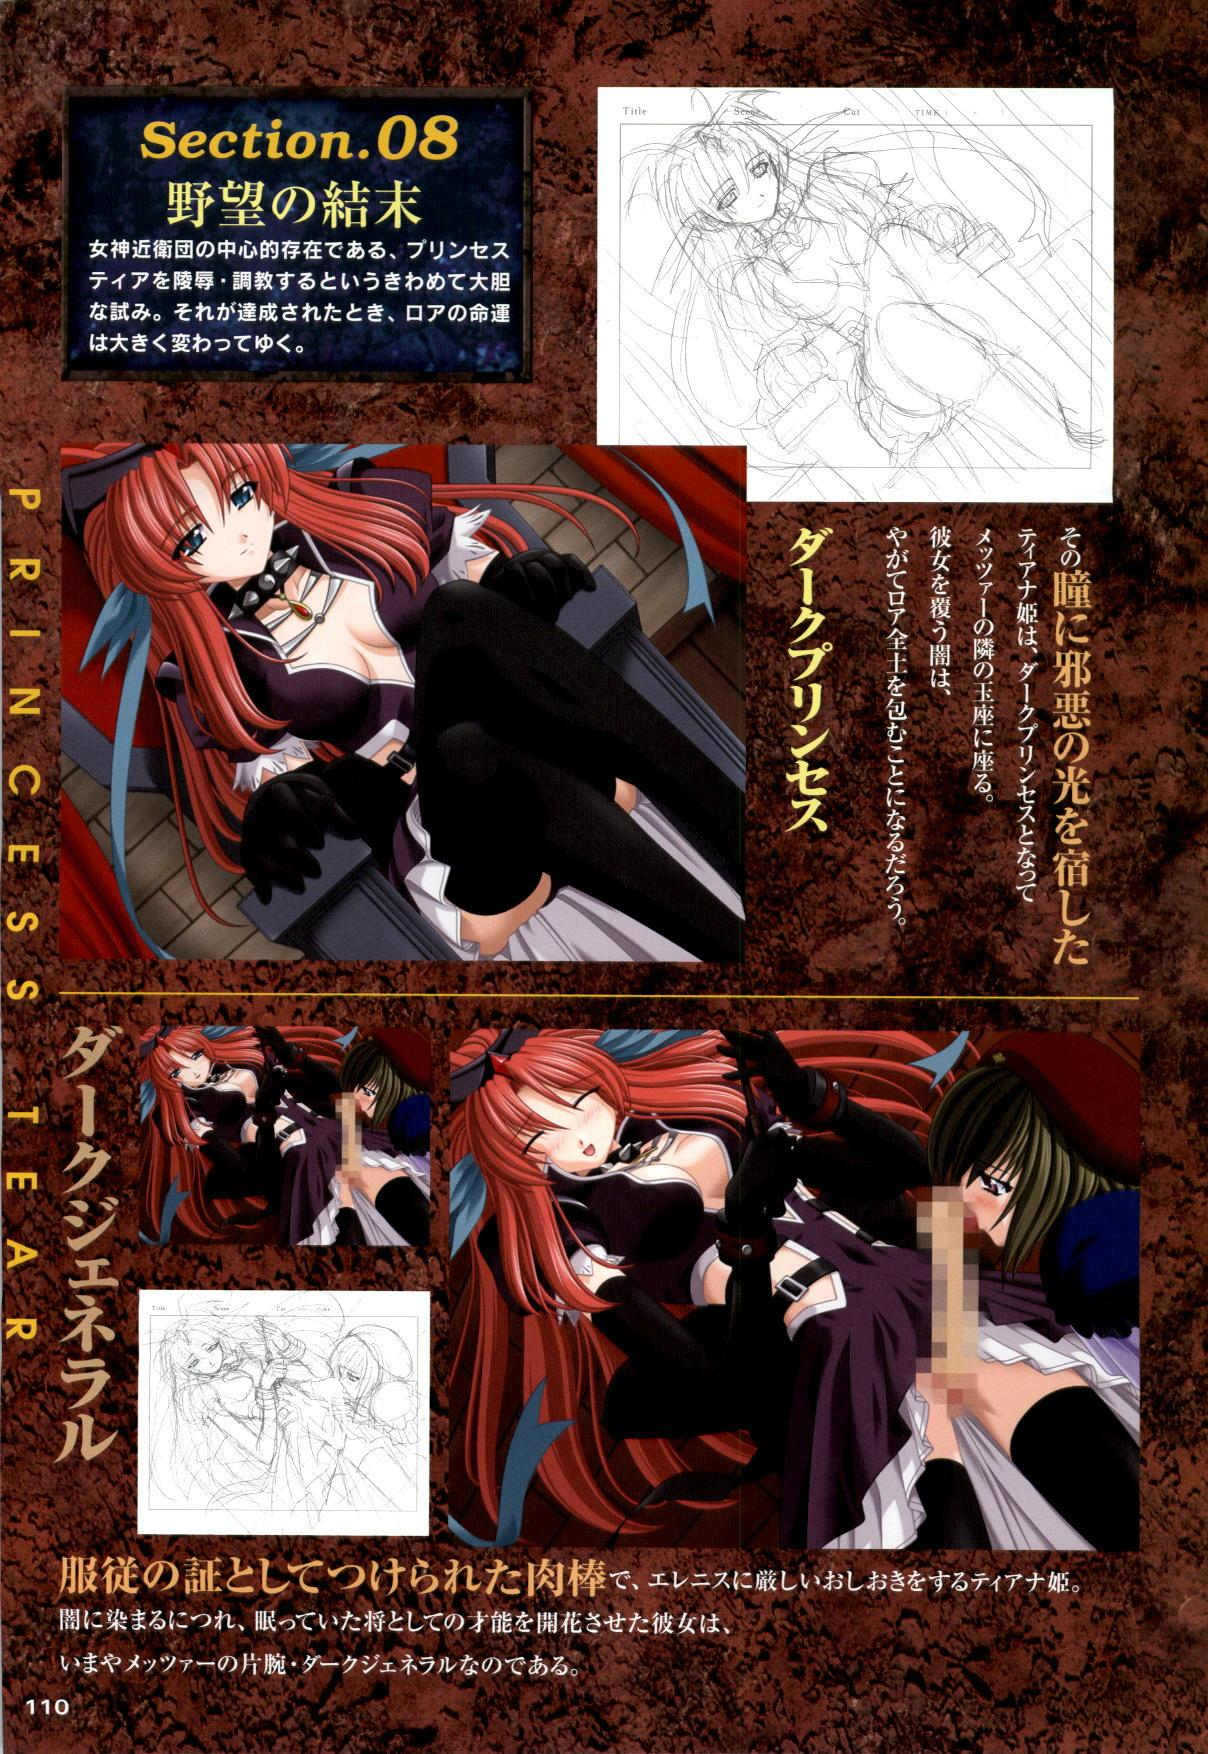 Mahou Senshi Sweet Knight & Mahou Senshi Princess Tear 109